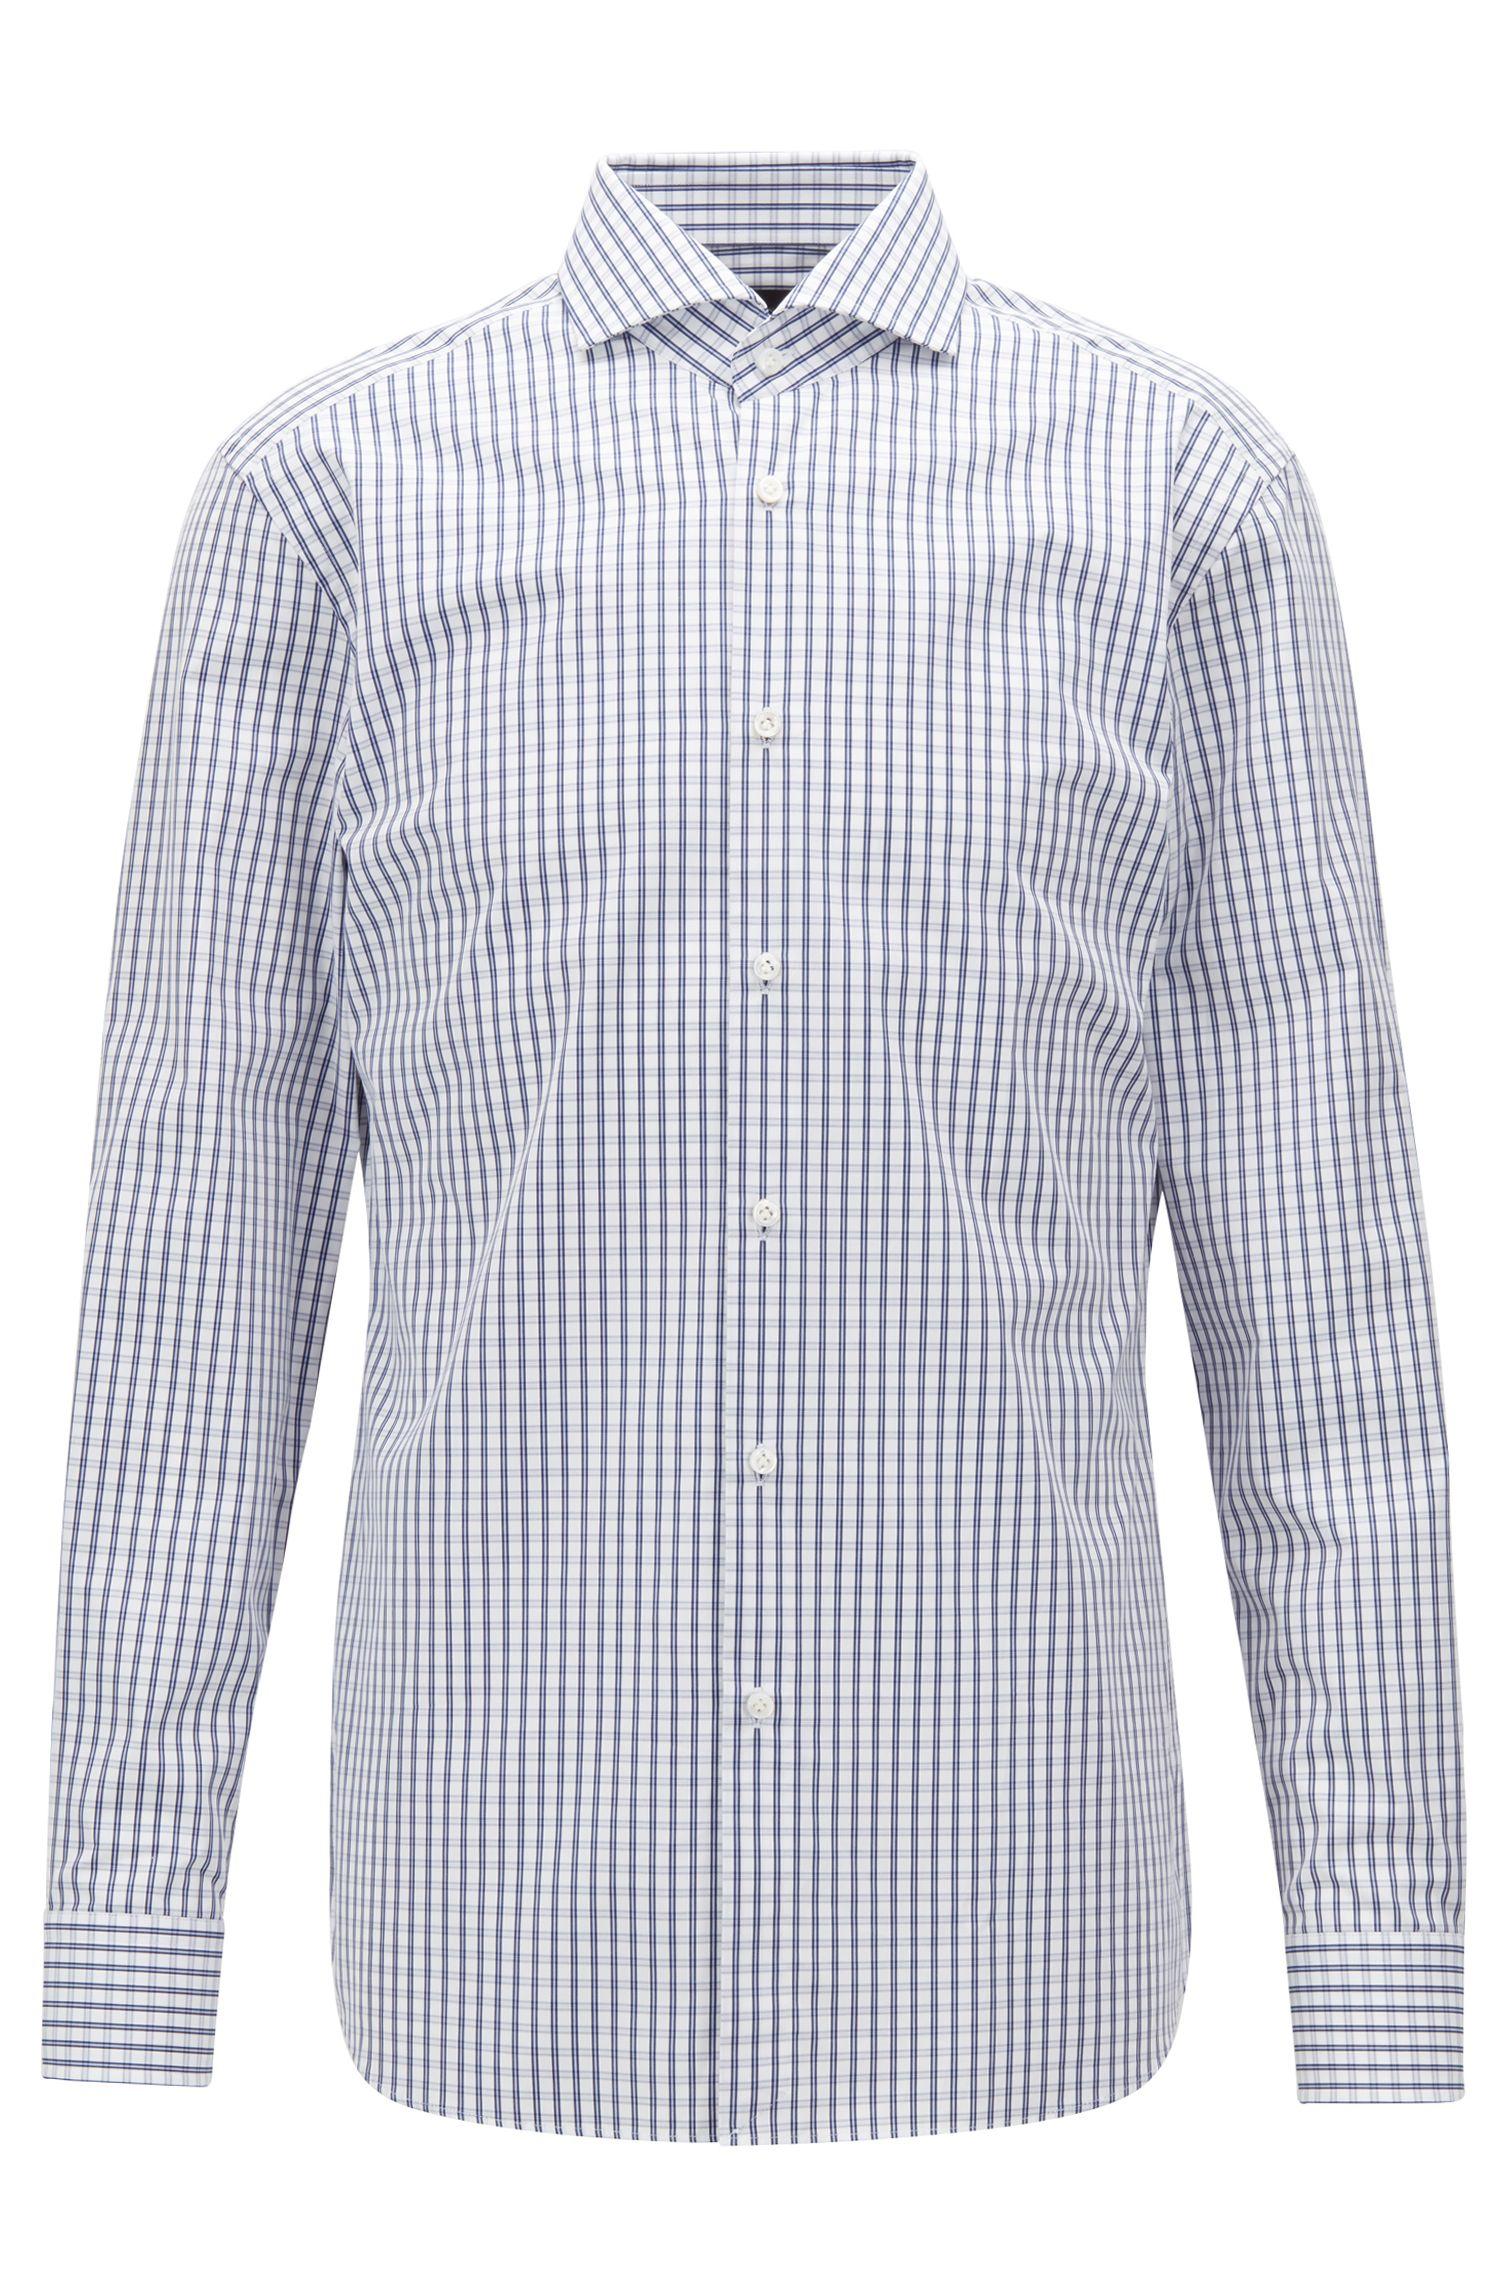 Slim-fit shirt in plain-check cotton poplin, Blue